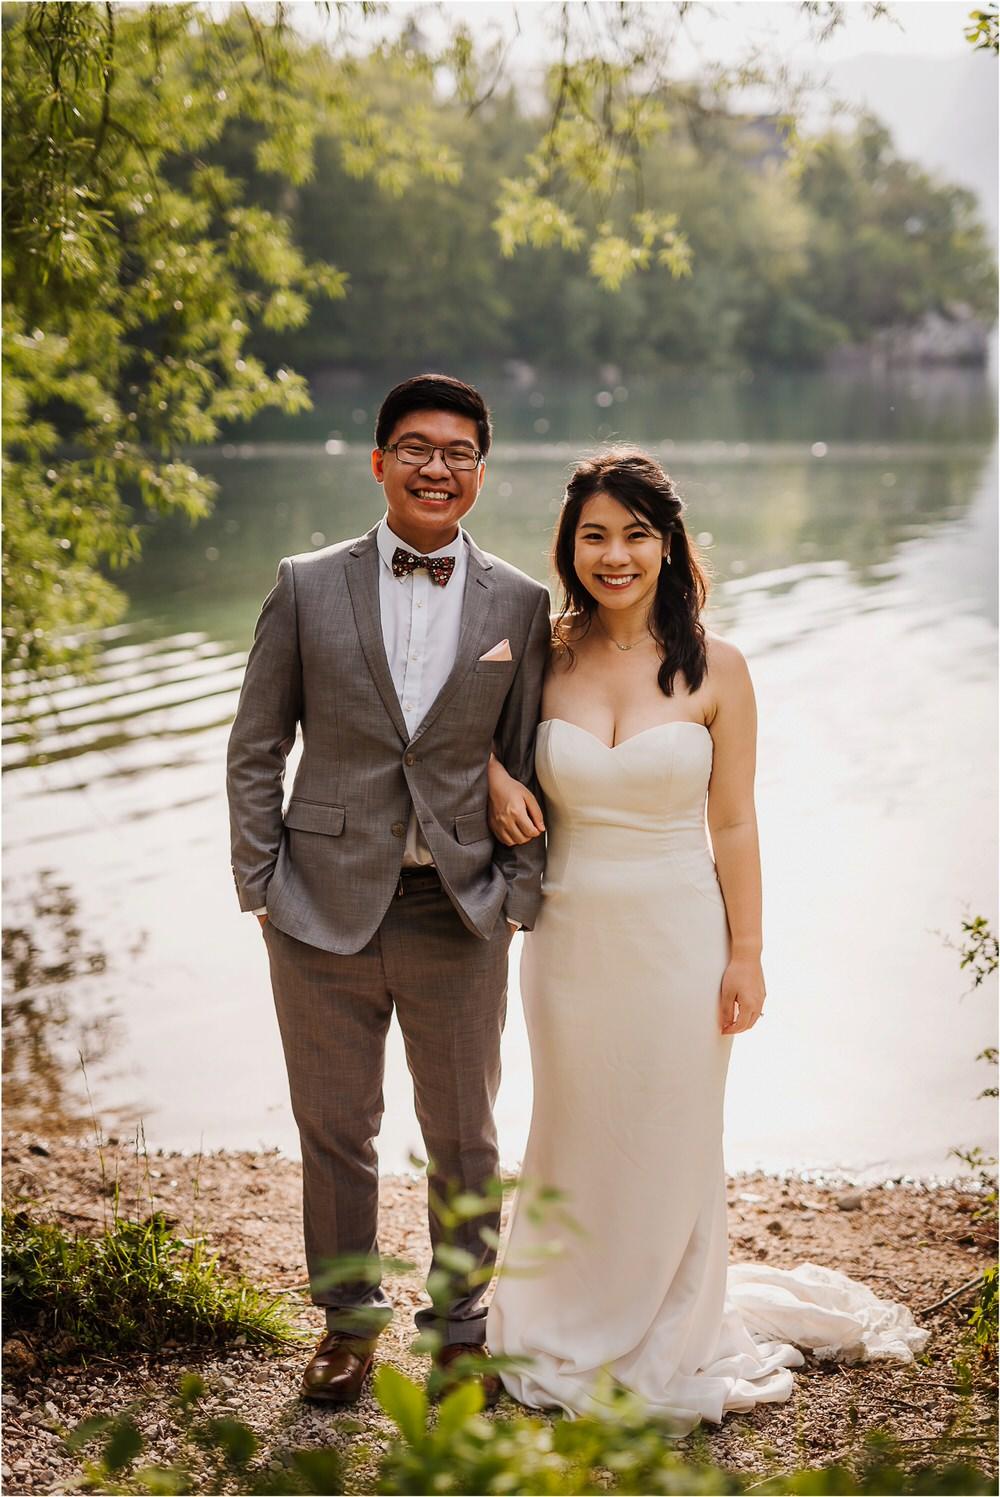 prewedding bled lake slovenia asian couple ljubljana engagement singapore love bohinj lake 0036.jpg